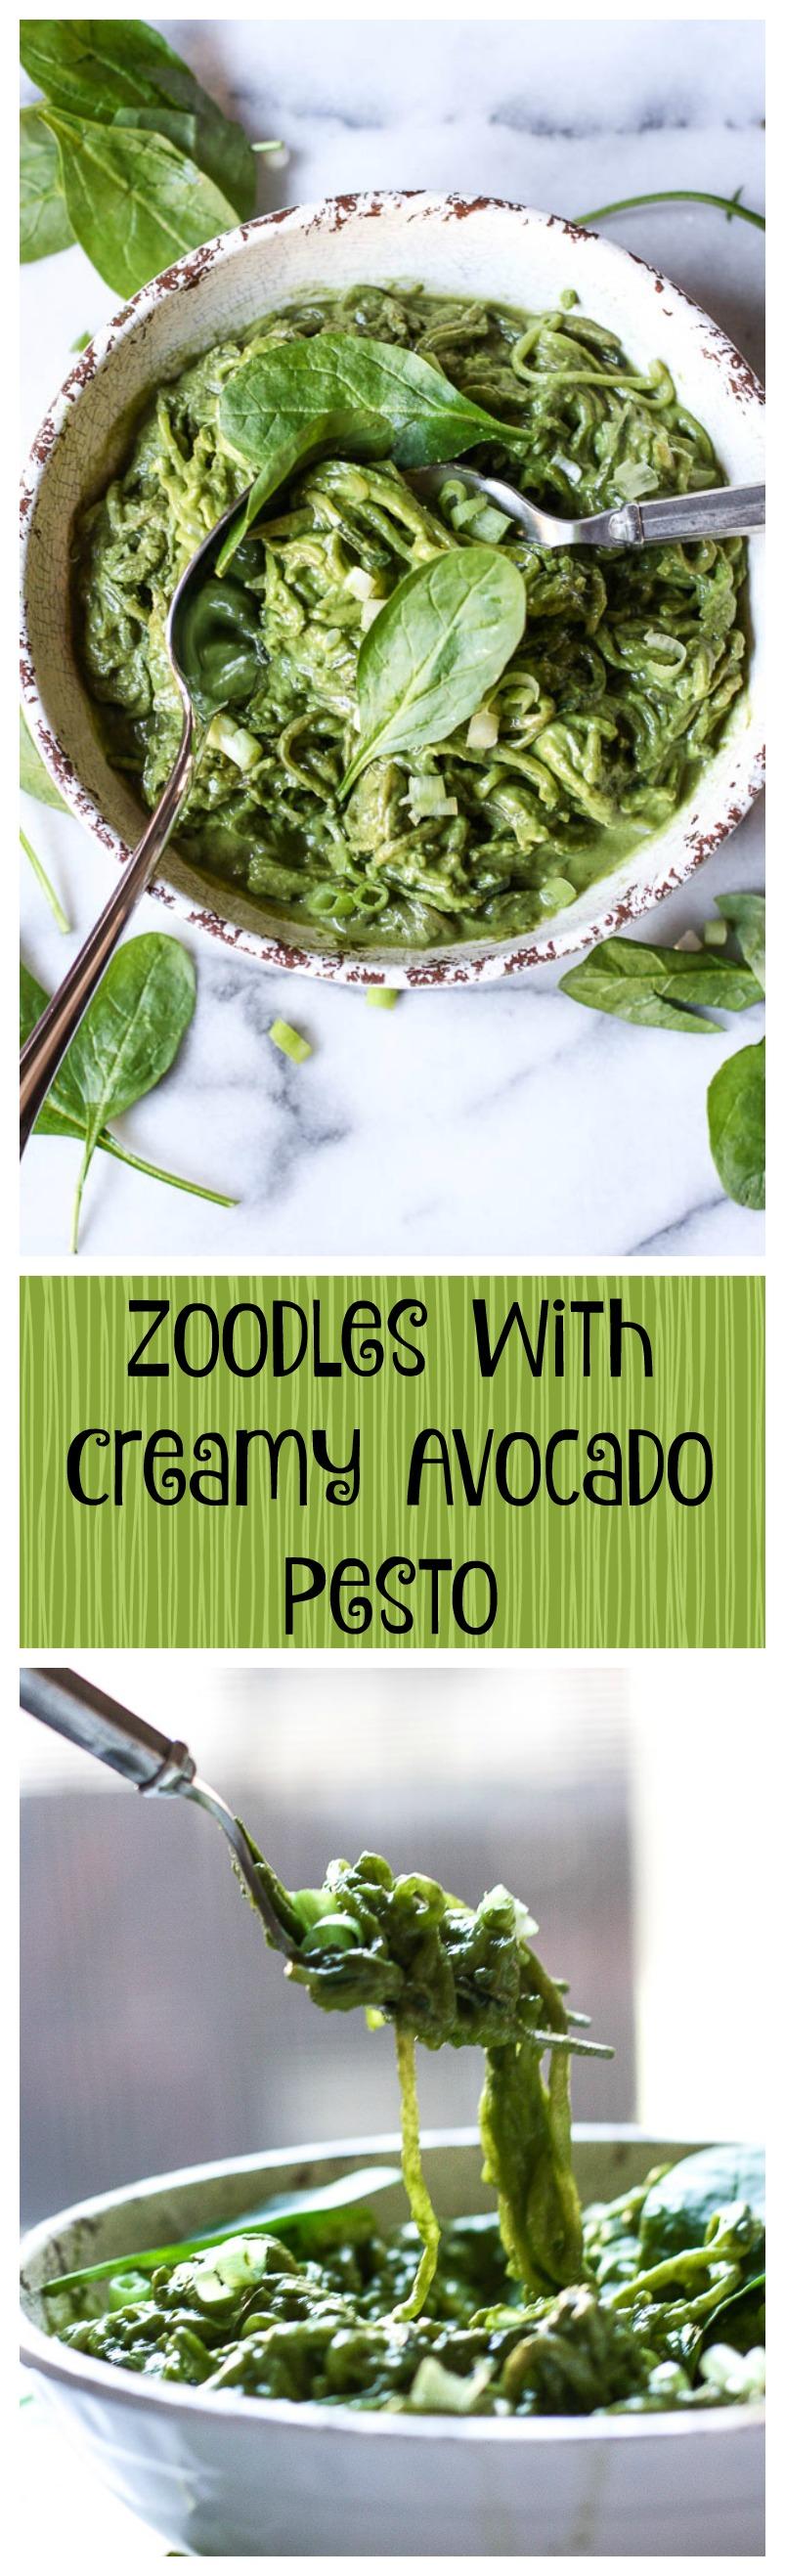 zoodles with creamy avocado pesto